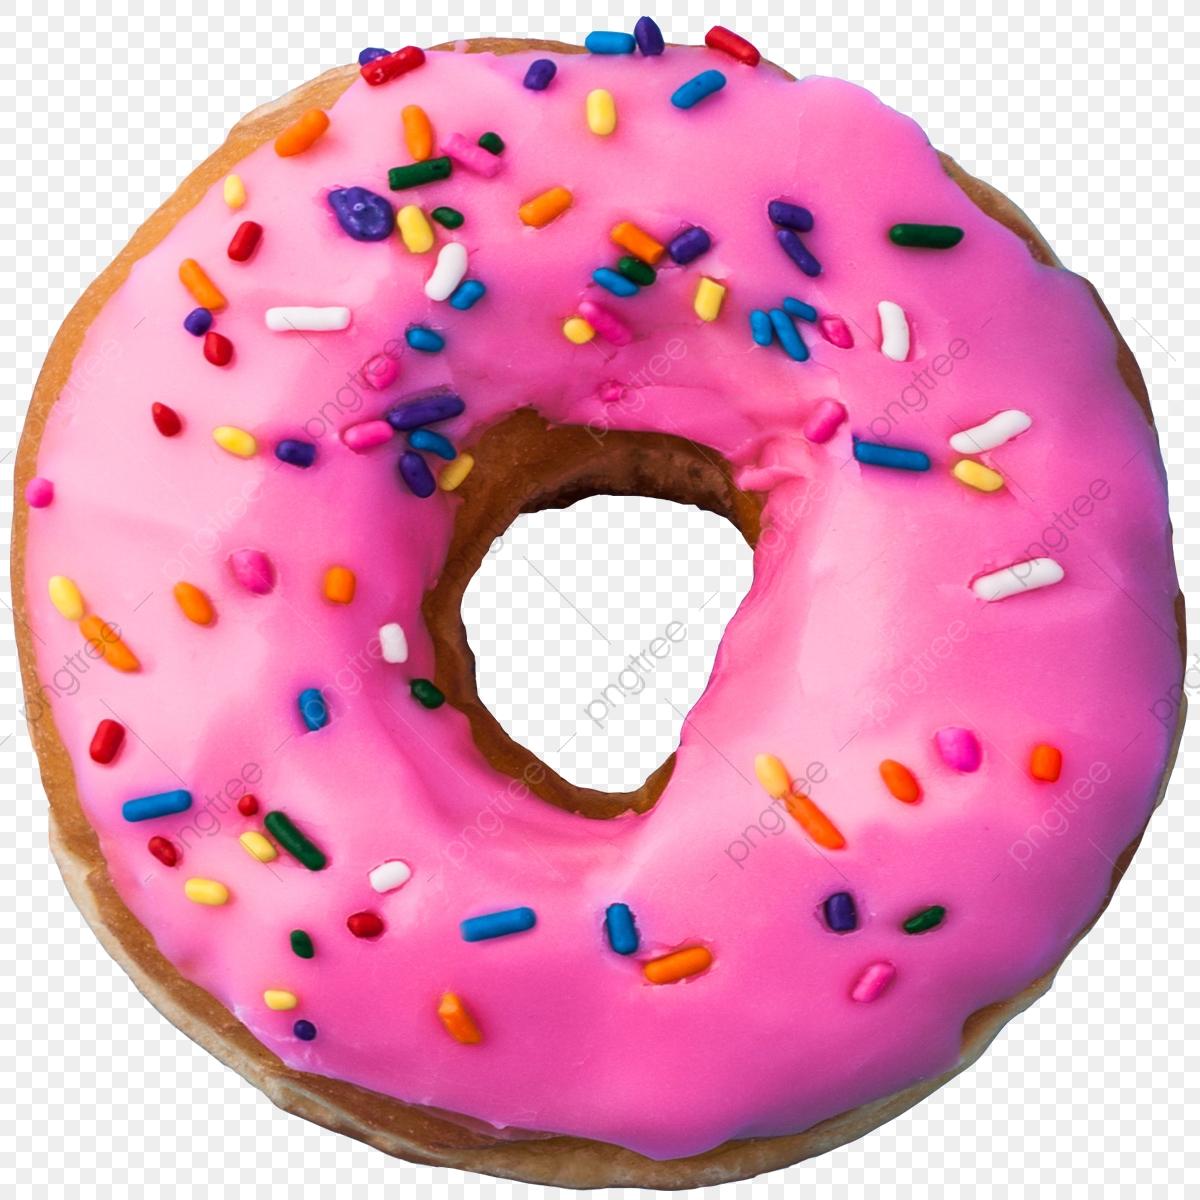 Pink Donut Vector, Png, Donut, Donuts PNG Transparent.